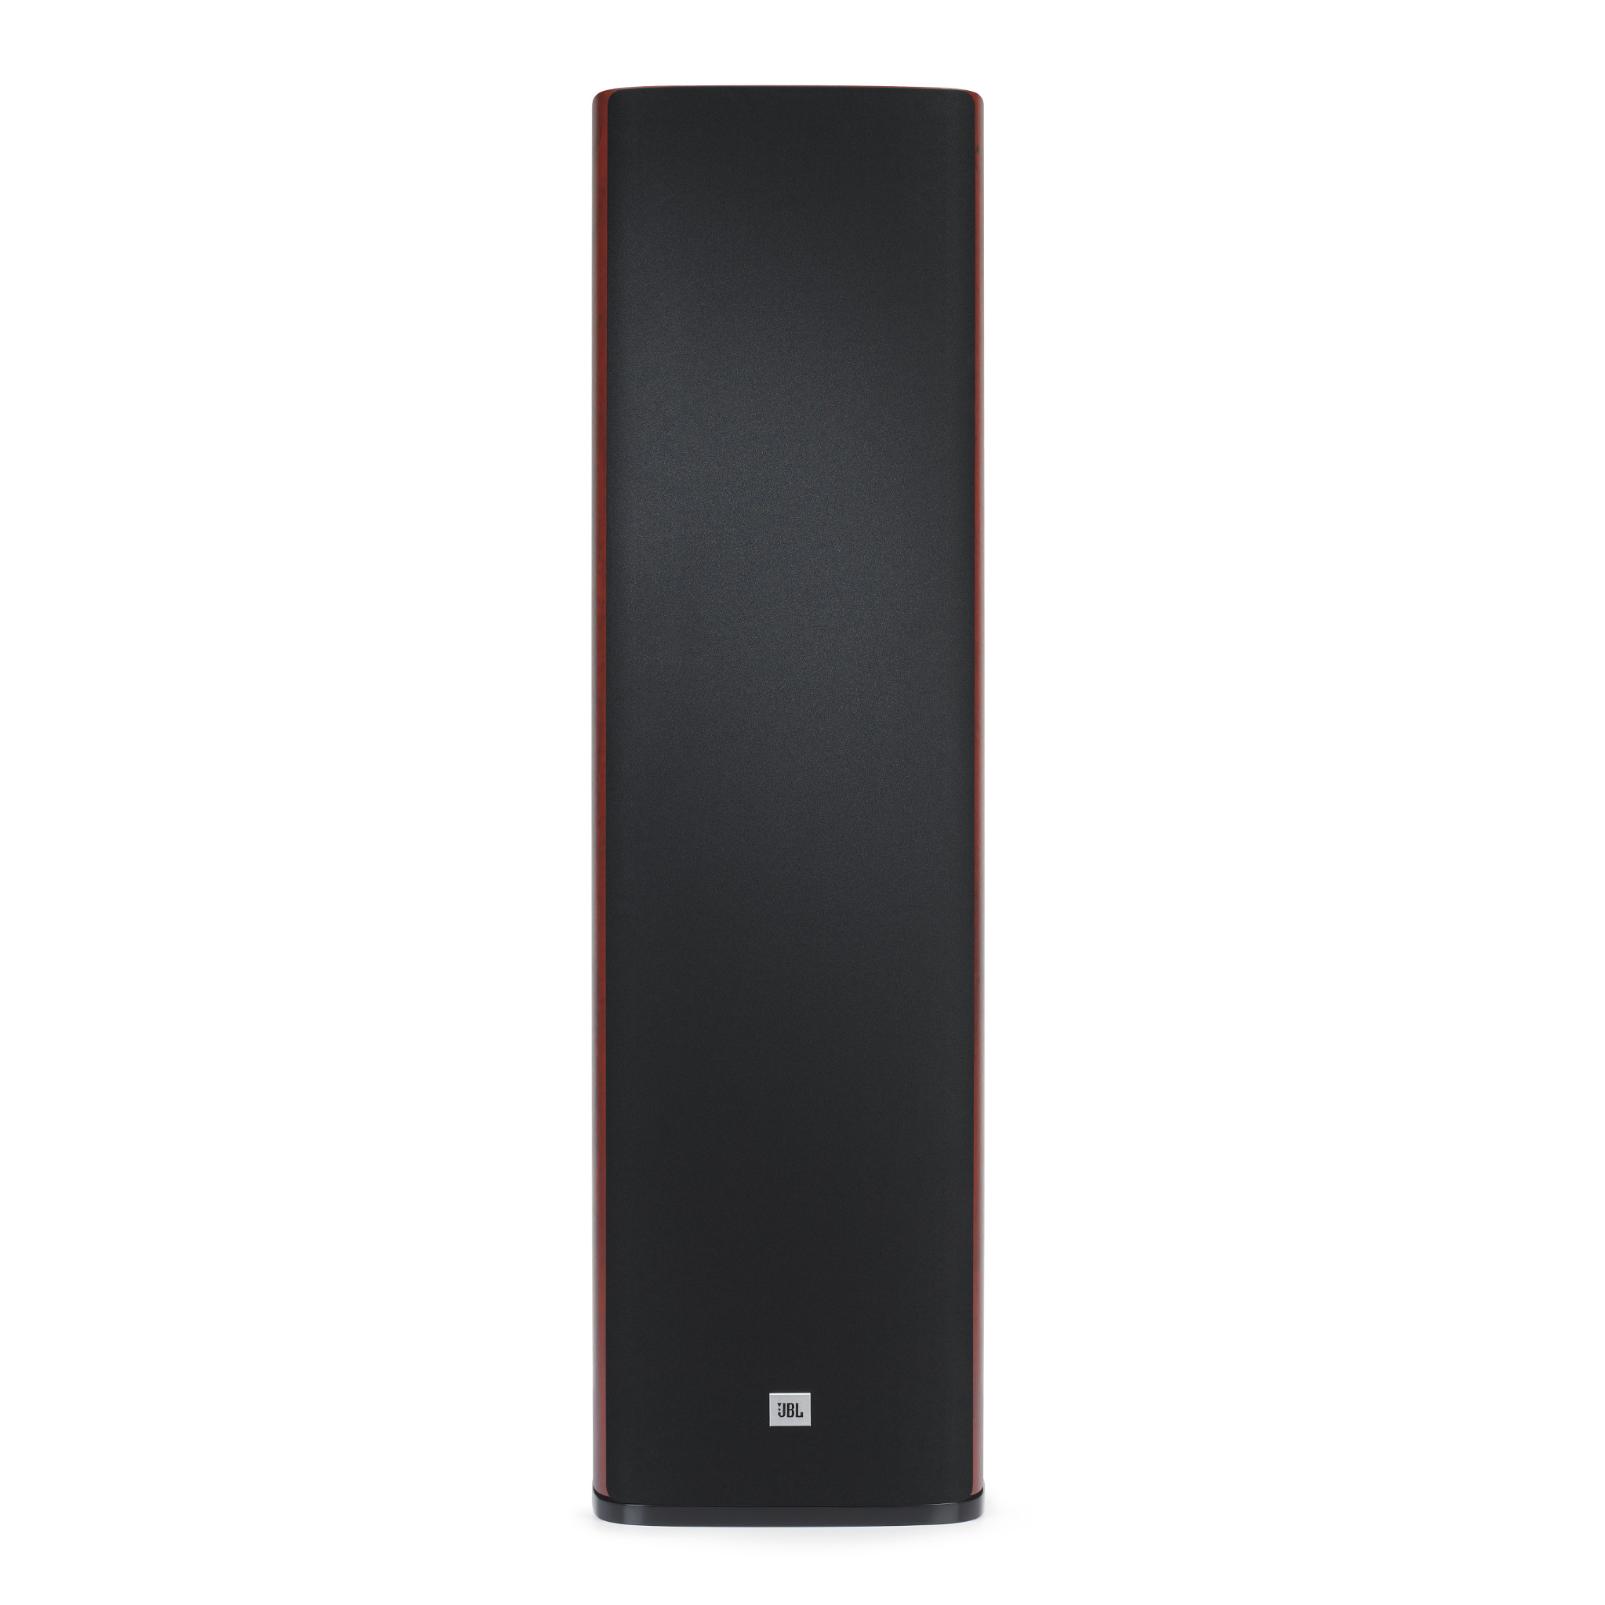 JBL STUDIO 690 - Wood - Home Audio Loudspeaker System - Detailshot 2